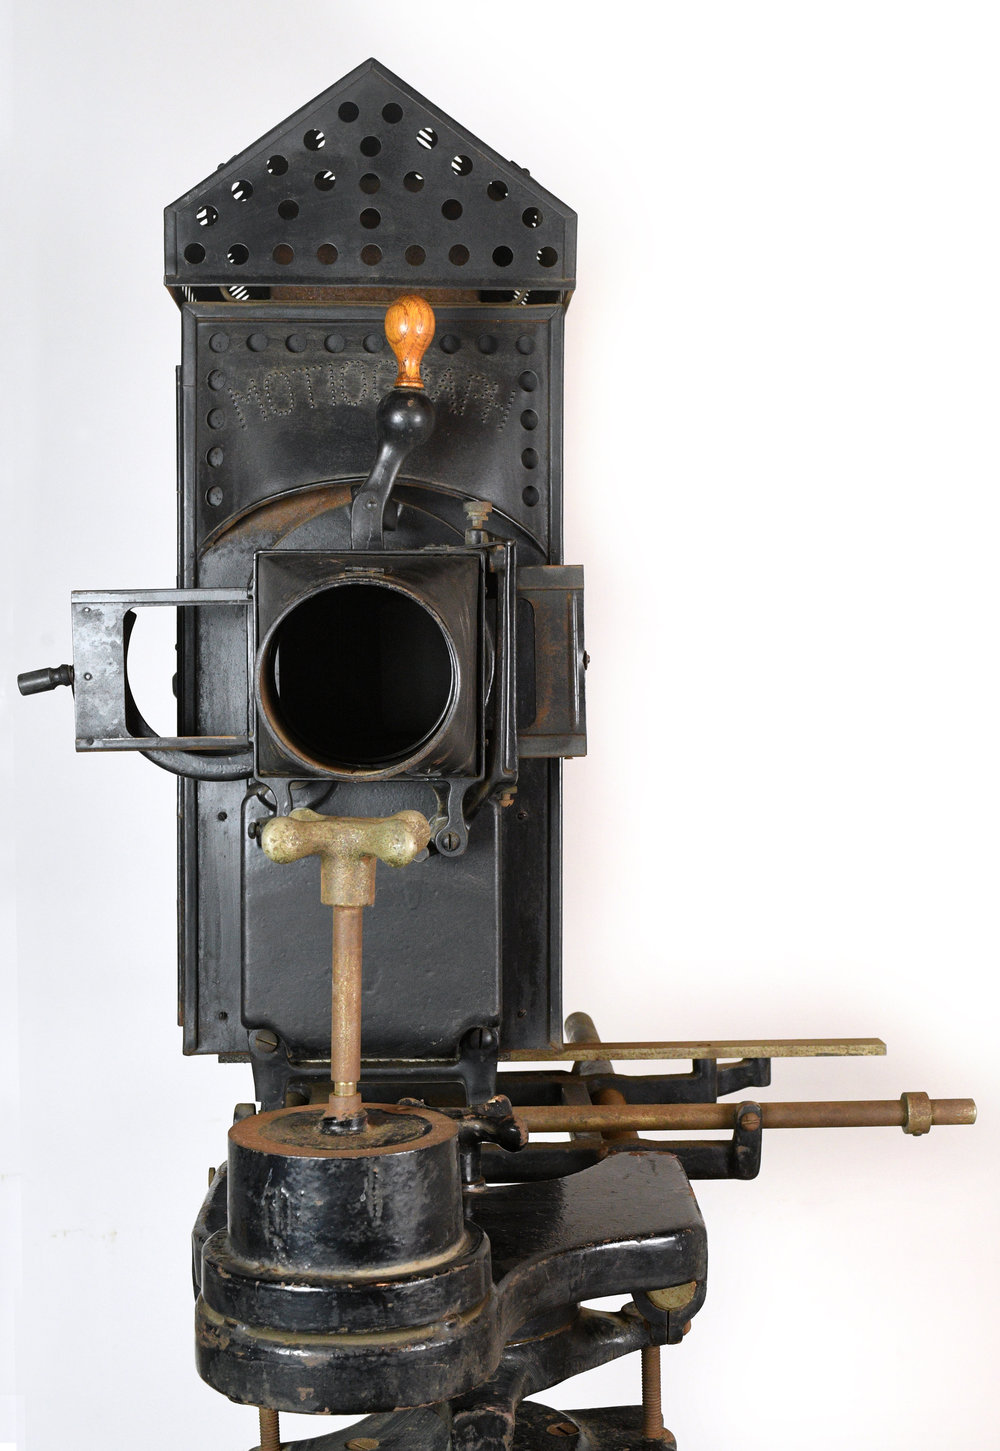 47904-motiograph-projector-lens-2.jpg